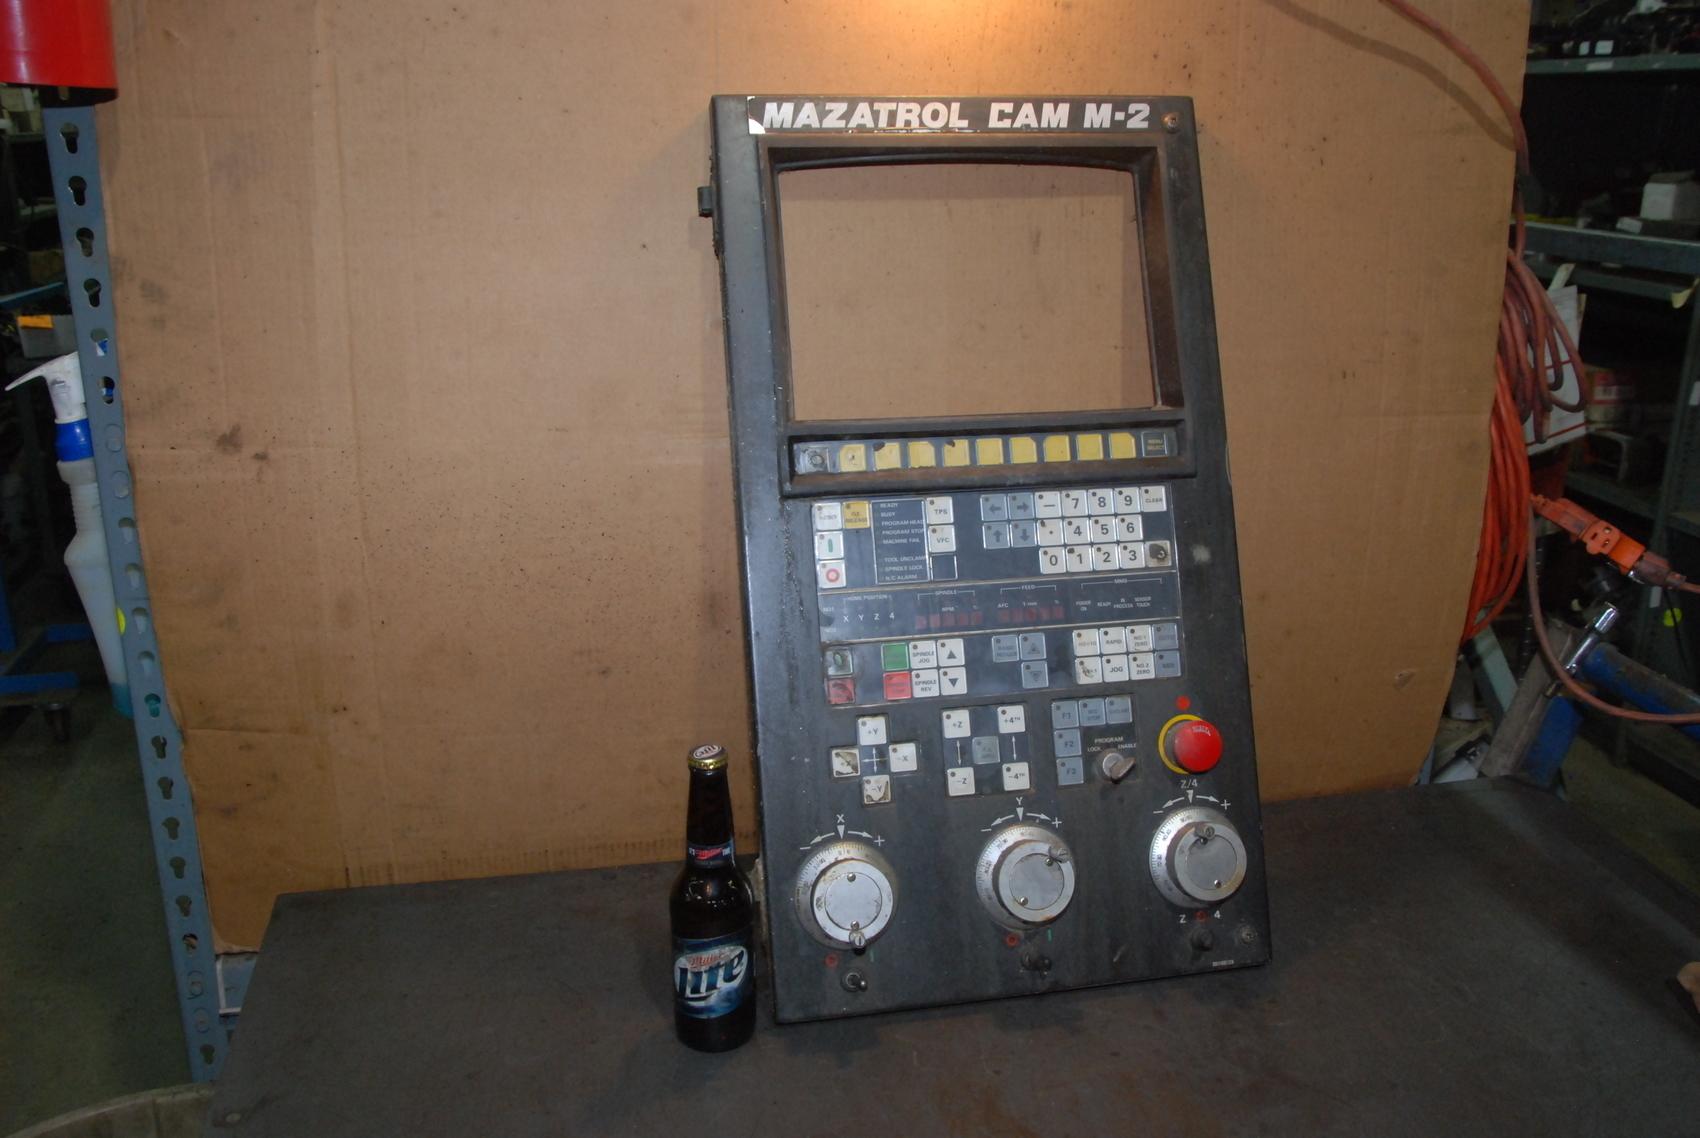 MAZATROL CAM M-2 CONTROL PANEL